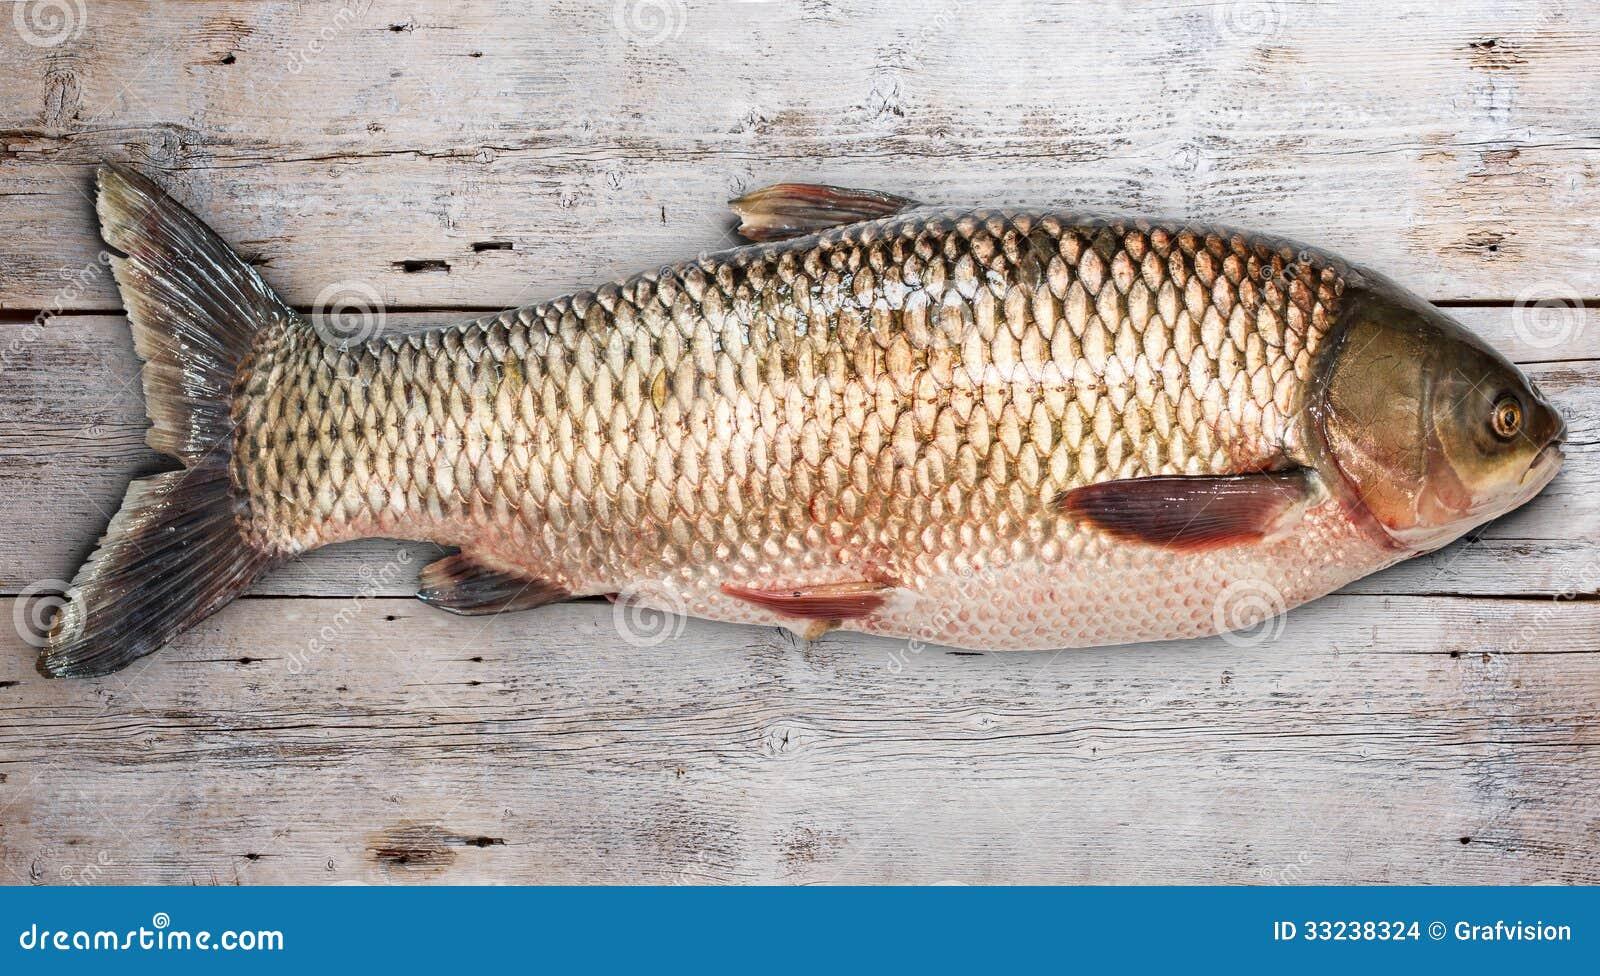 Grass carp stock photo image of carp angling industry for Grass carp fish